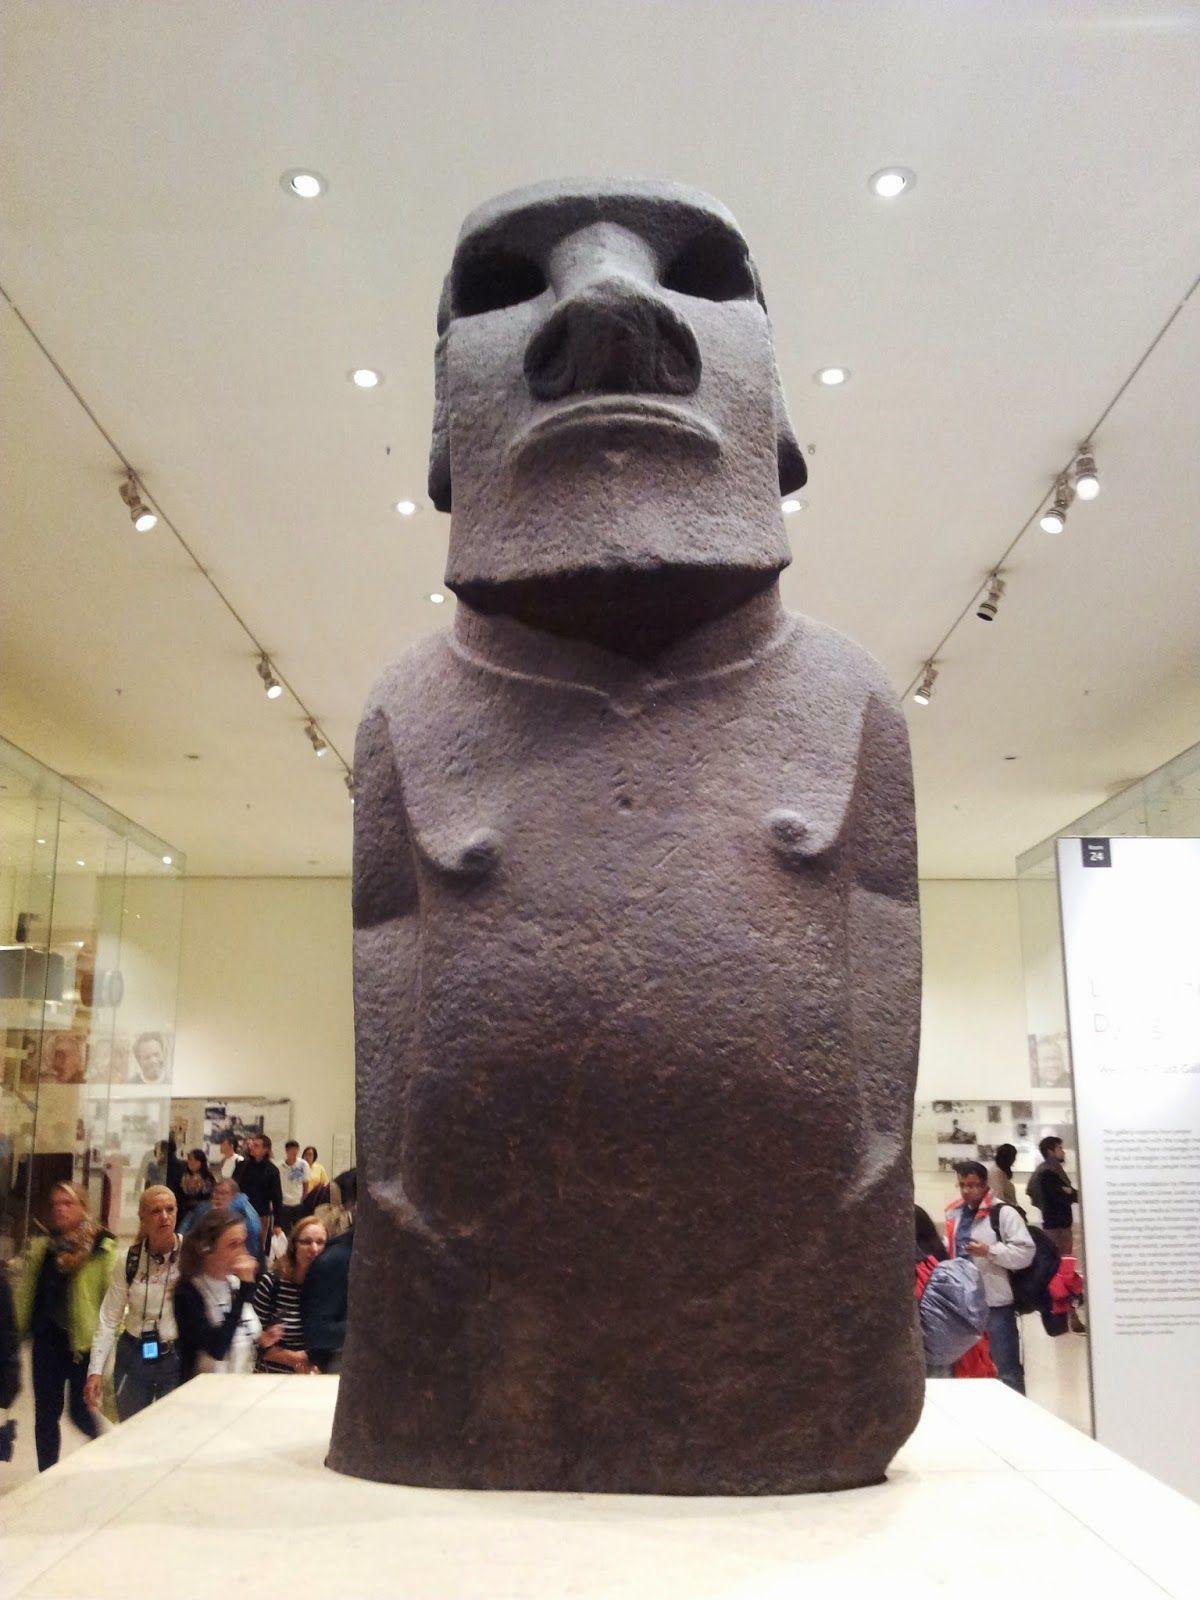 Rompiballe On The Road: The British Museum -  #london #travel #britishmuseum #londra #londontour #visitlondon #viaggi